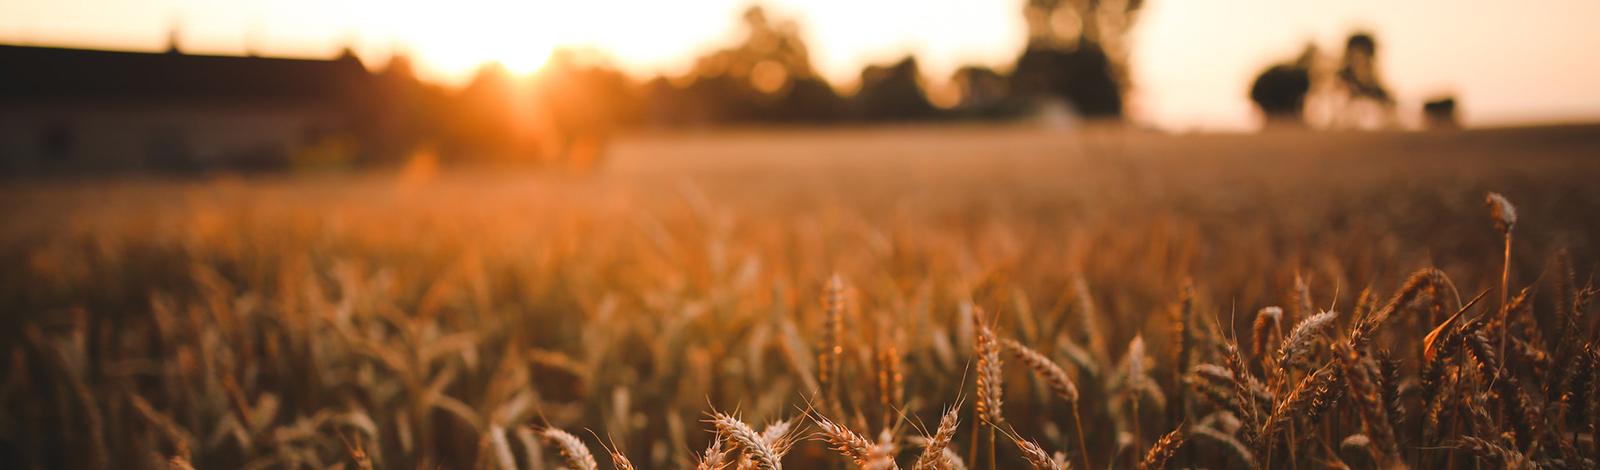 A Kansas landscape at sundown